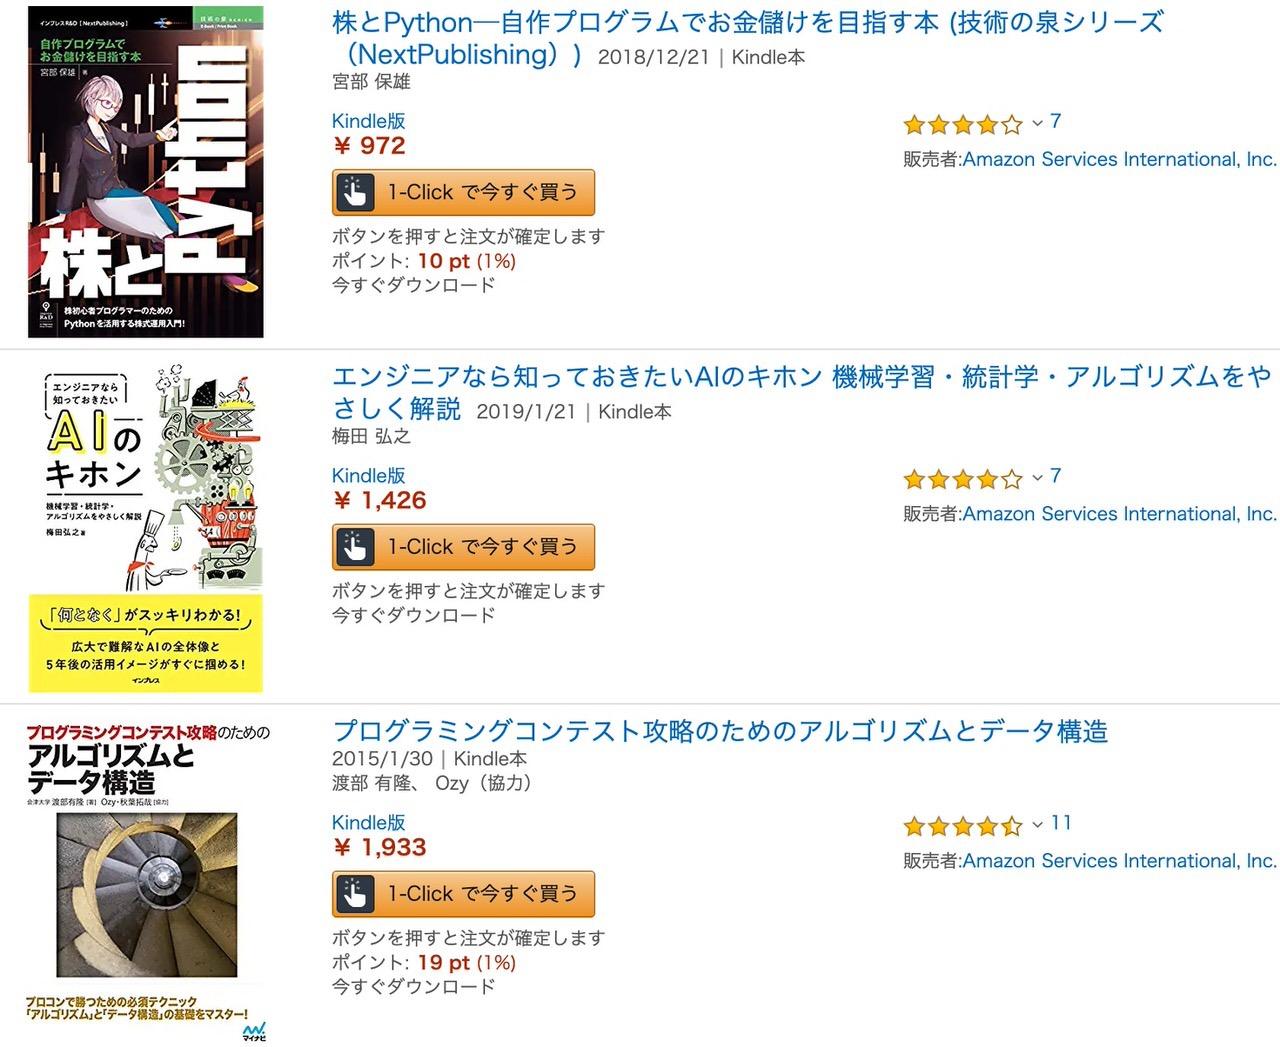 【Kindleセール】最大70%オフ!「出版社合同プログラミング書 サマーセール」(9/12まで)